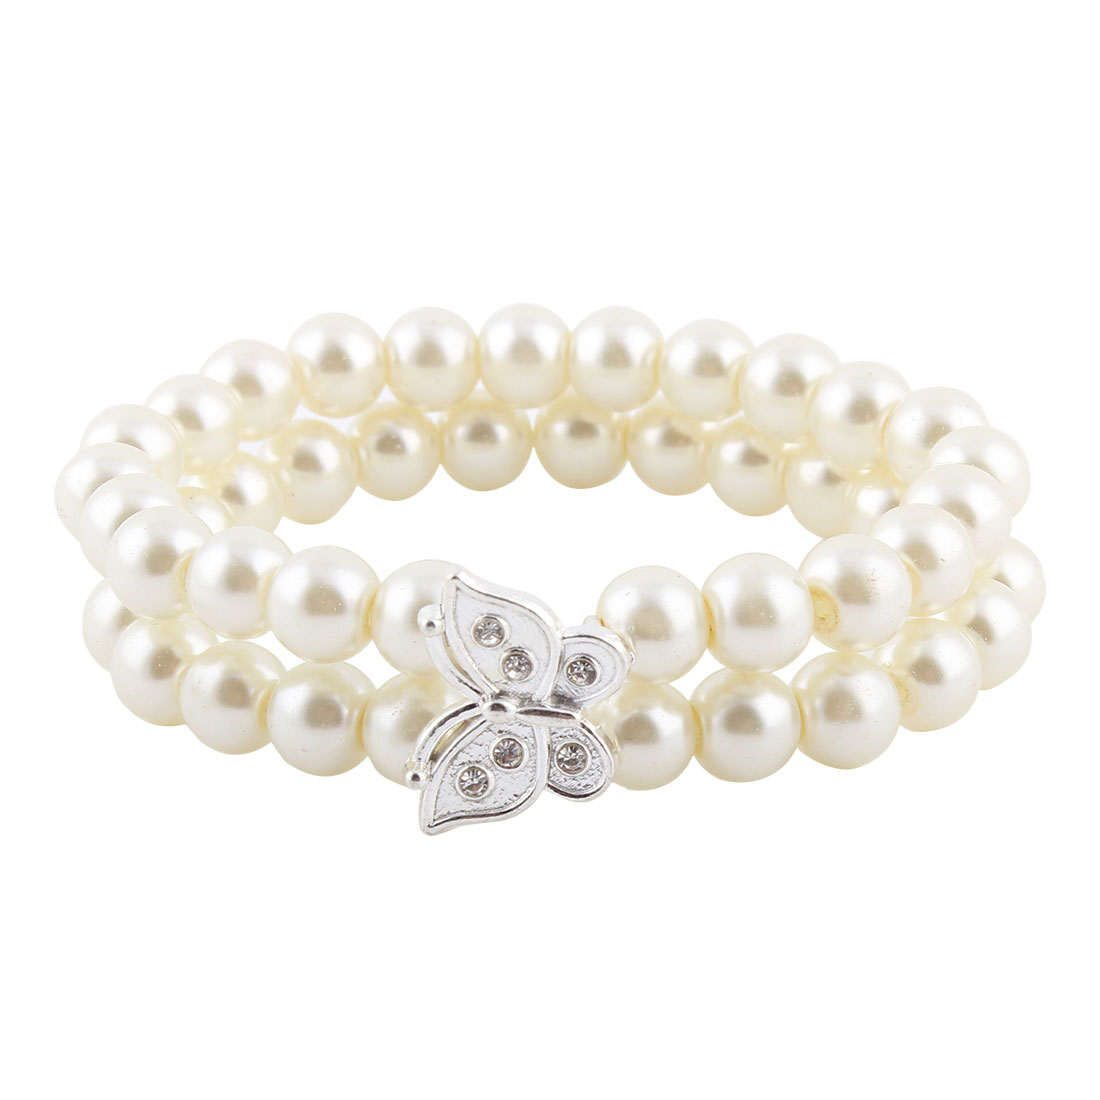 Women Jewelry Imitation Pearls Beads Butterfly Shaped Elastic Wrist Bracelet White